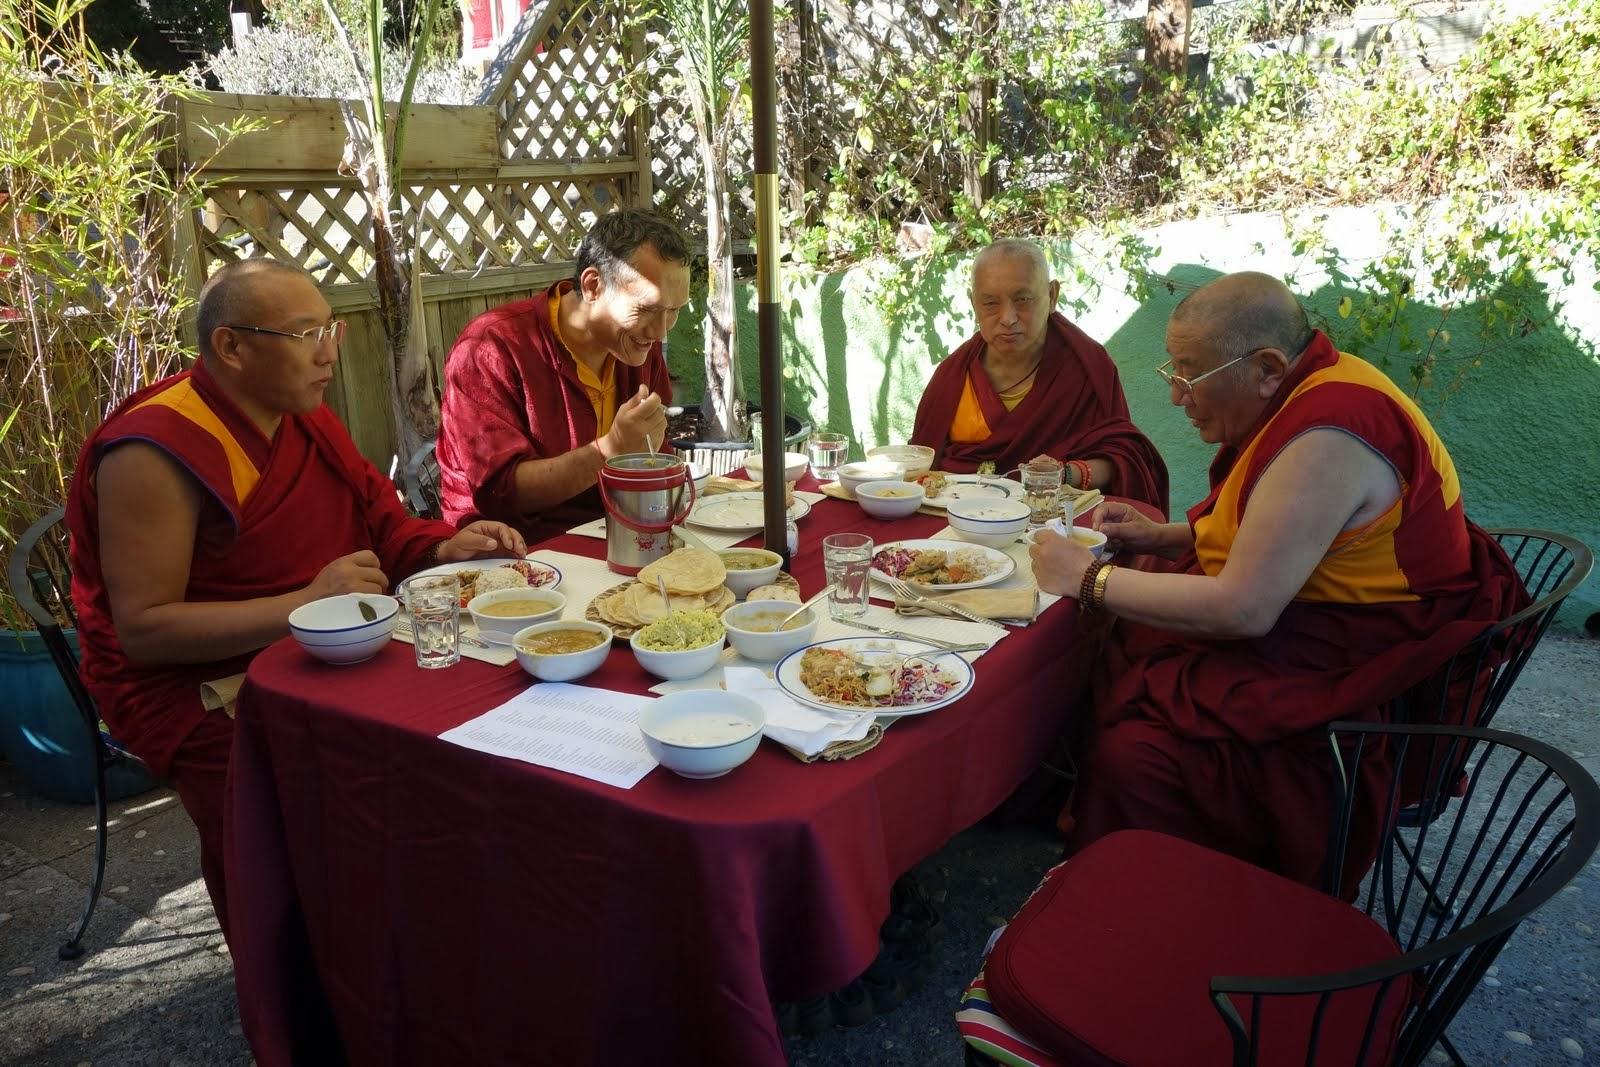 Dagri Rinpoche, Yangsi Rinpoche, Lama Zopa Rinpoche and Geshe Ngawnag Dakpa enjoying lunch offered after long life puja for Lama Zopa Rinpoche at Land of Medicine Buddha Sept. 29, 2013 Photo: Ven. Roger Kunsang